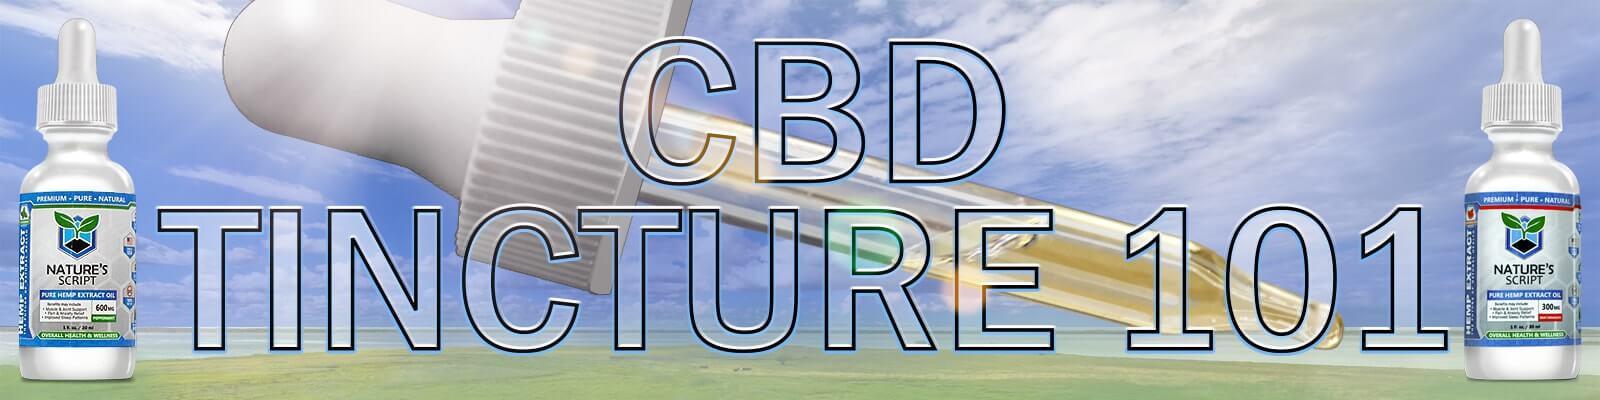 cbd tincture 101 banner